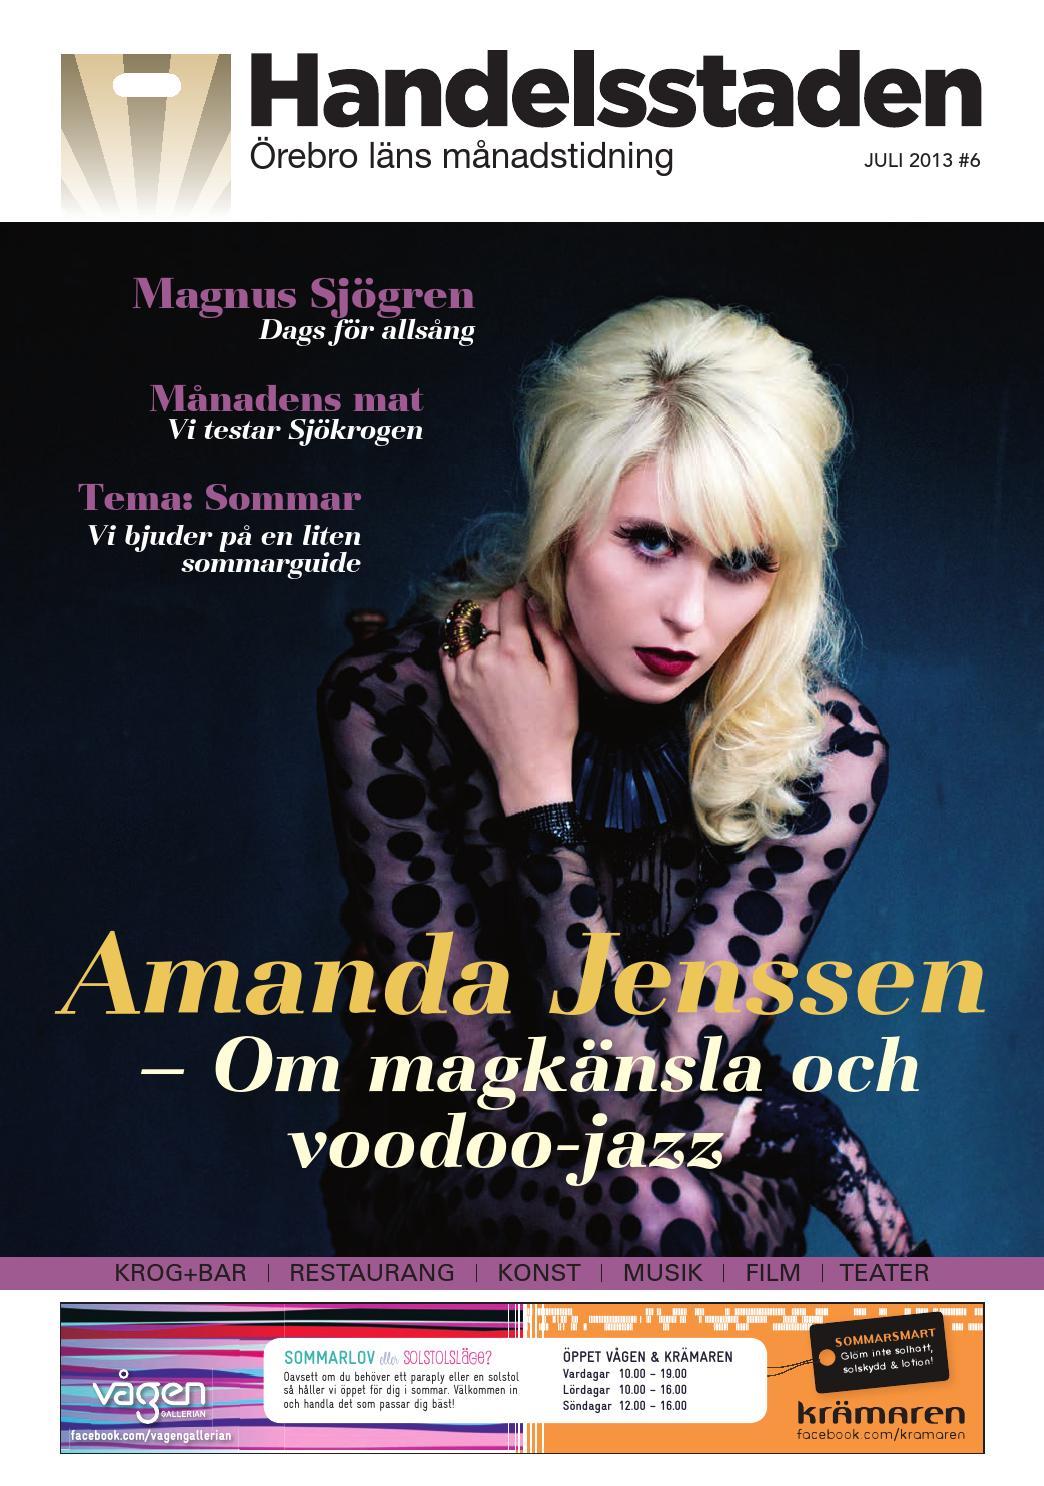 Ina Edmark, 41 r i Ljungbyhed p Riseberga 1090 - Mrkoll